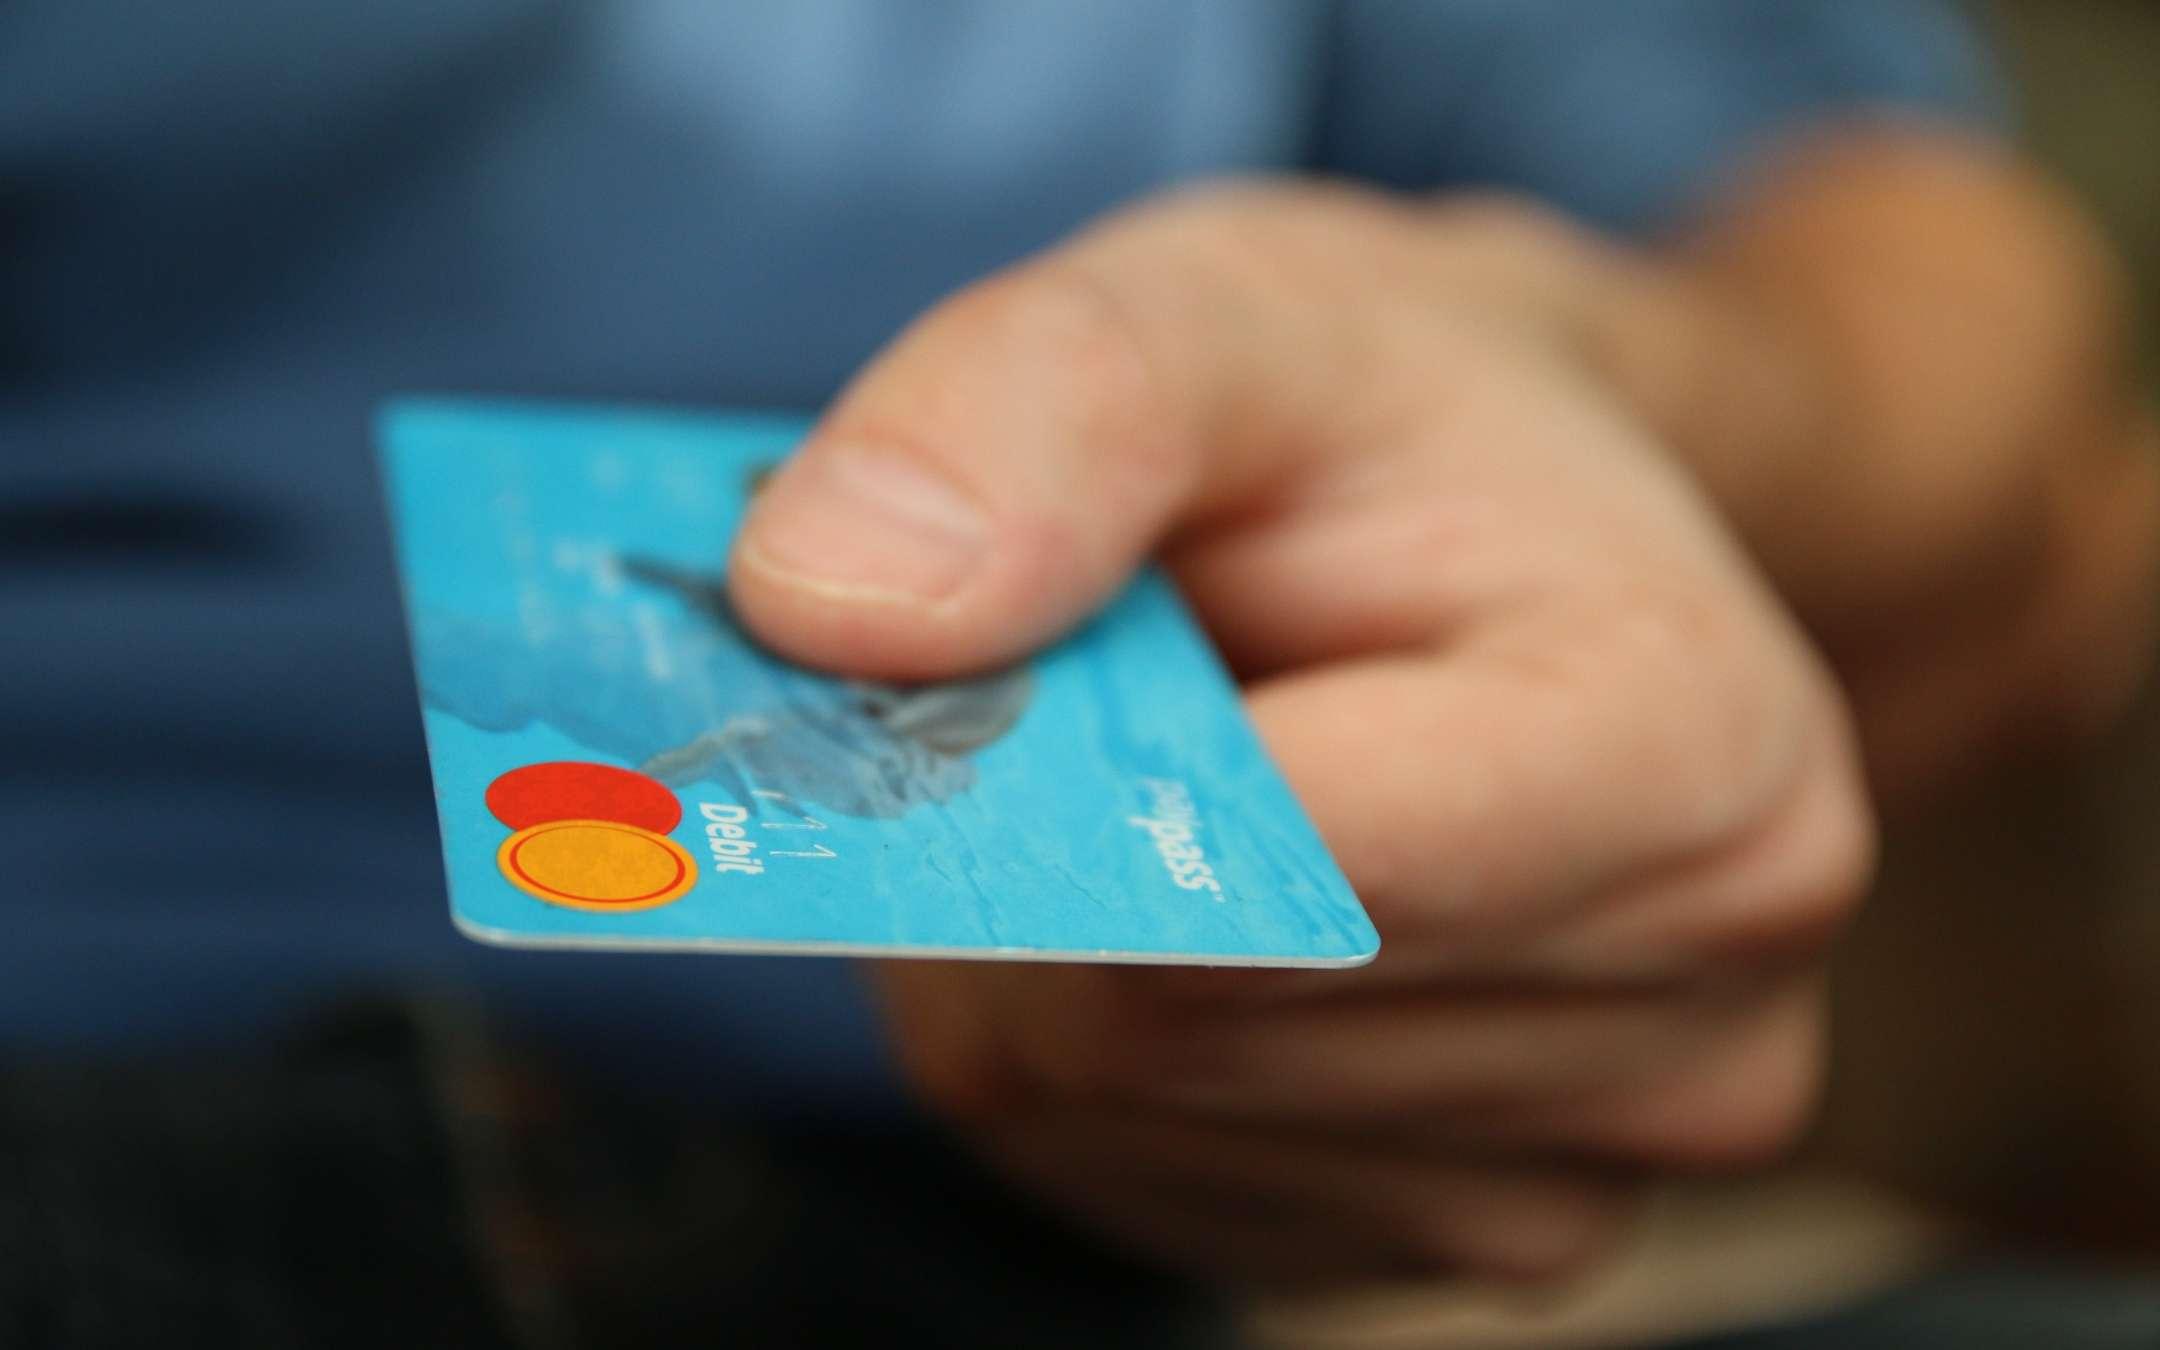 Find the best credit, debit or prepaid card